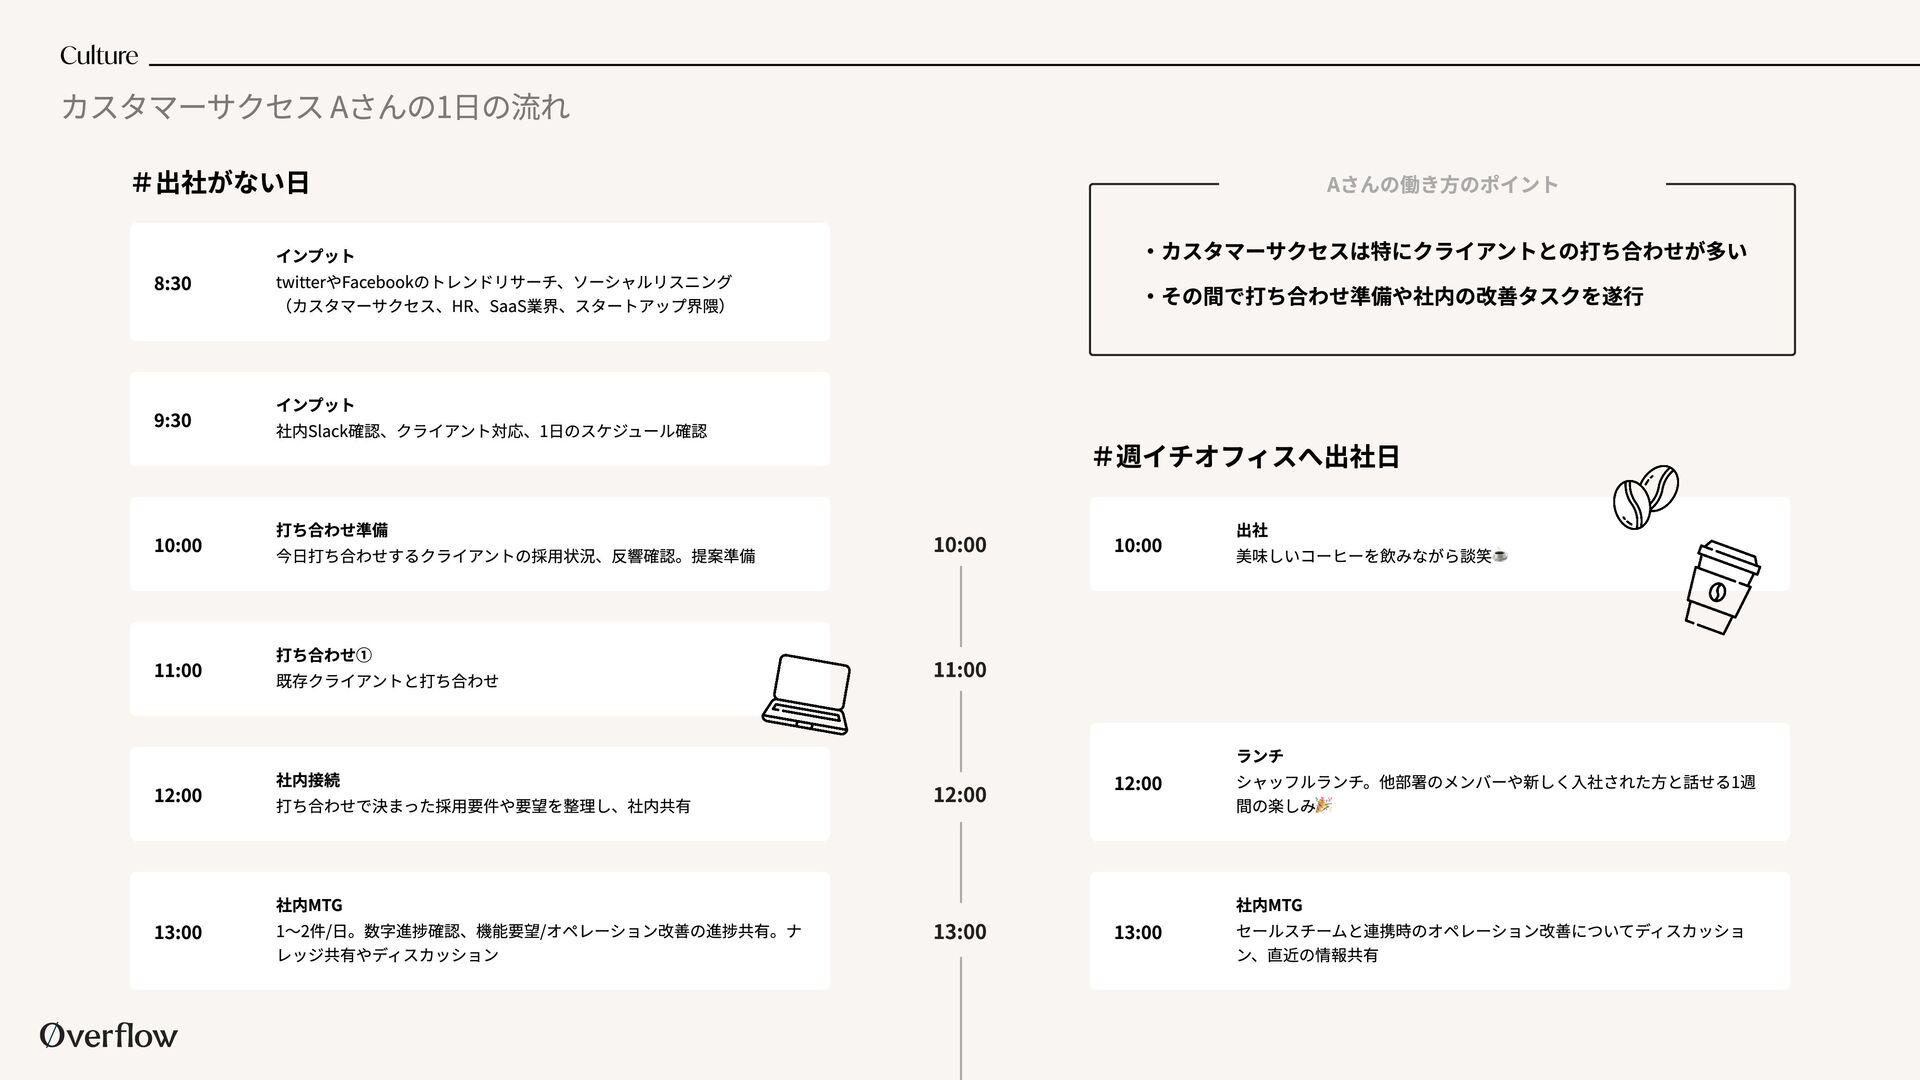 slackにオペレーションを集約 botからKPIレポートが毎日送信 請求書発行時期にbotか...